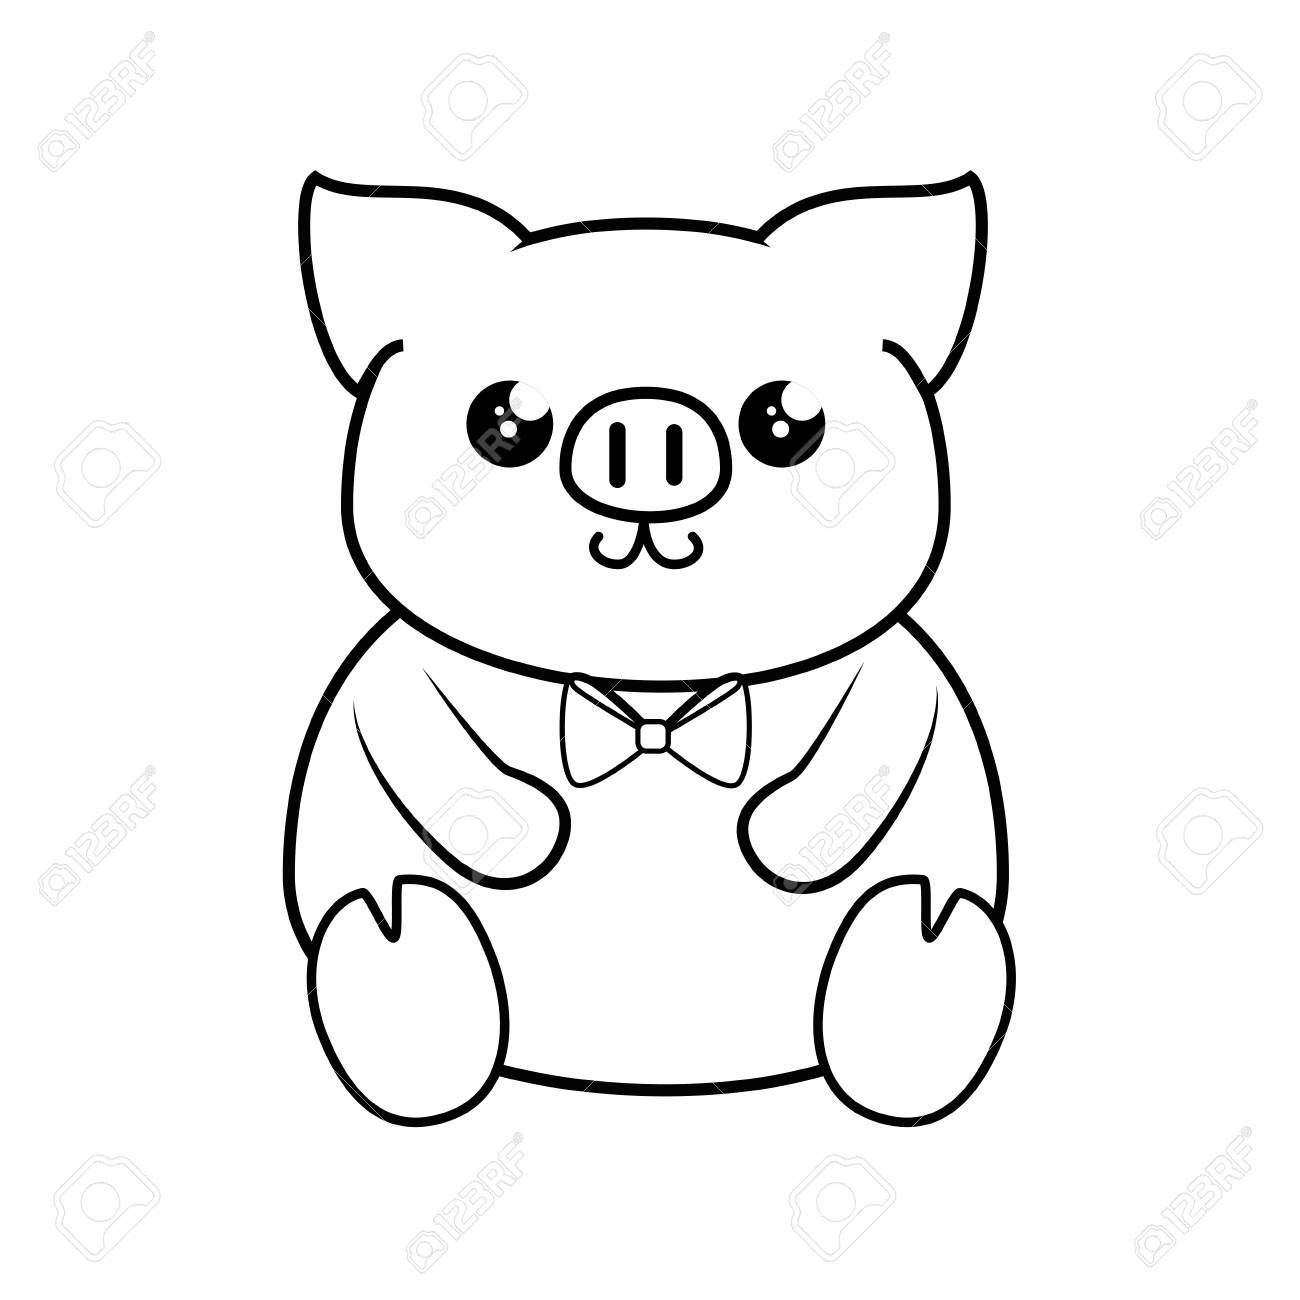 Pig Kawaii Cartoon Icon Vector Illustration Graphic Design Icon